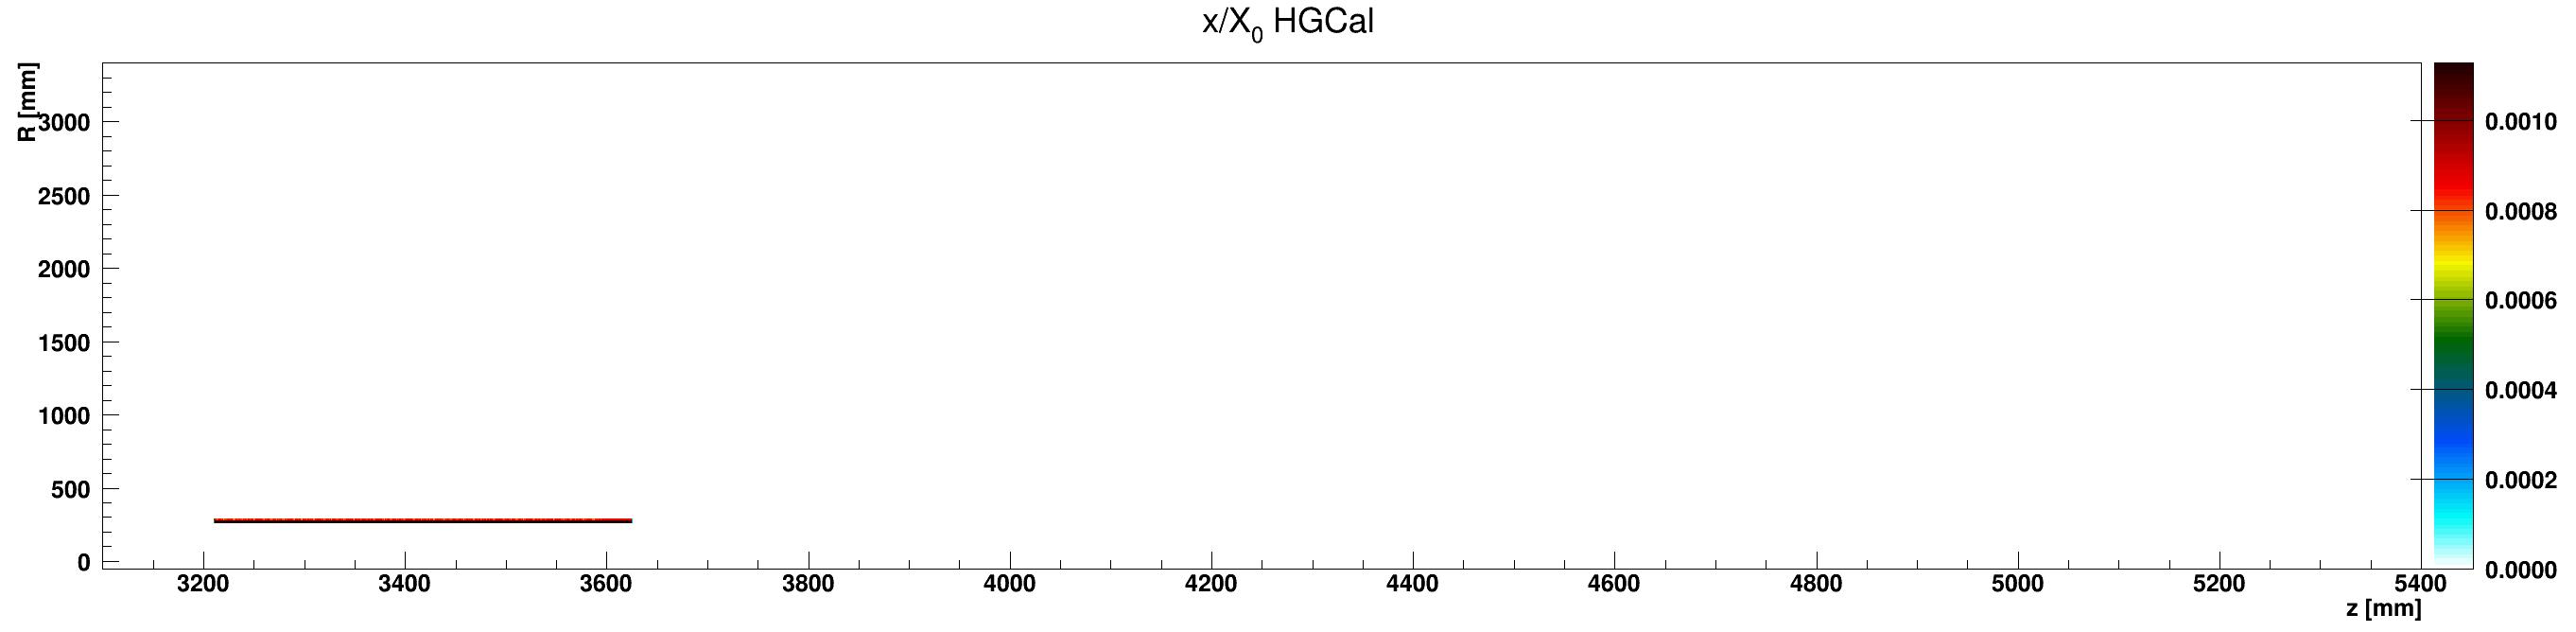 HGCal_x_vs_z_vs_RlocAluminium_ZplusZoom.png